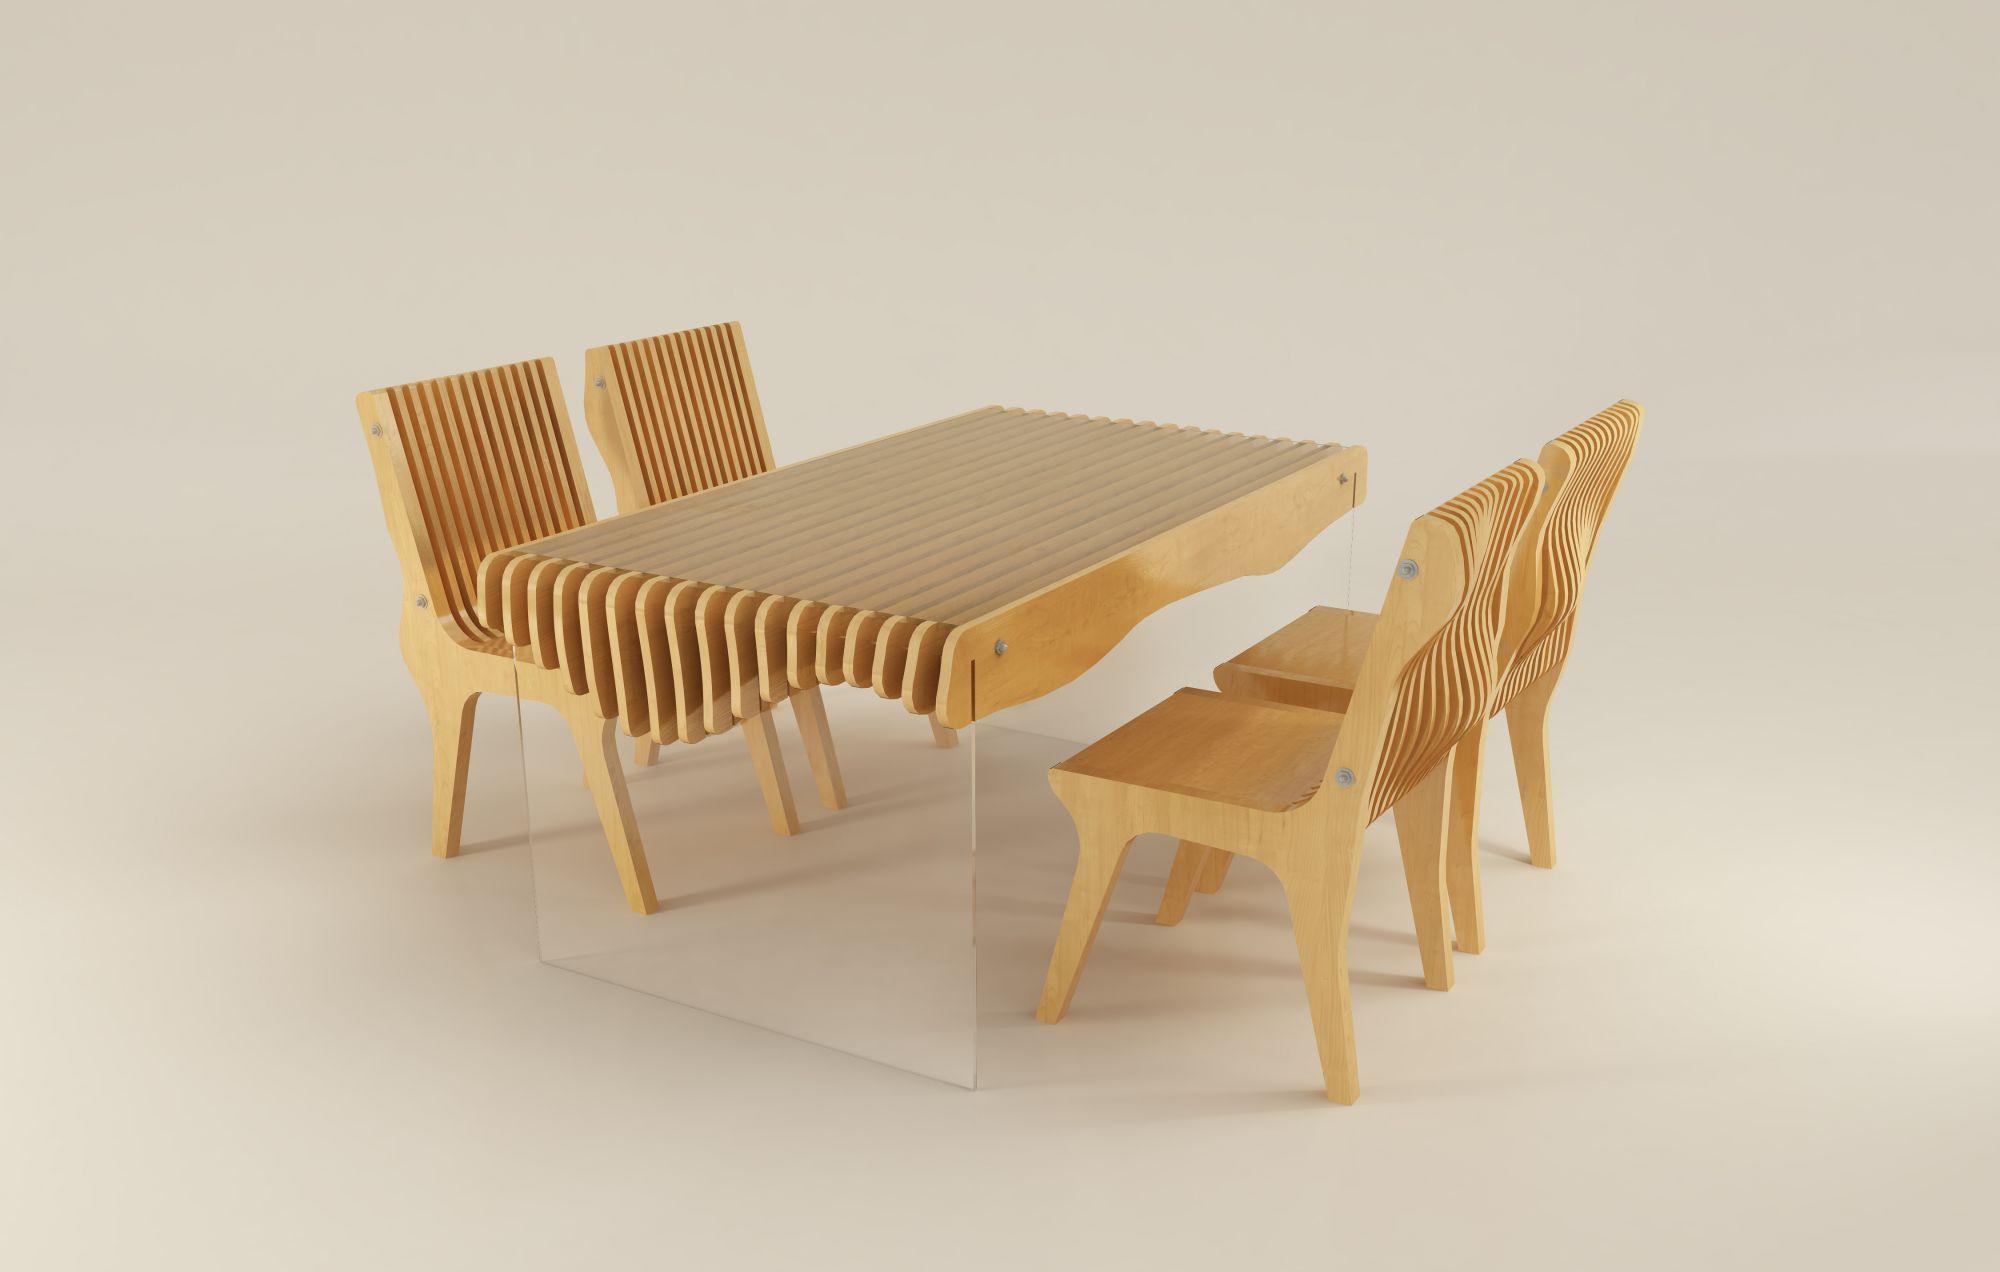 Wooden bedroom chairs designs - Parametric Furniture By Laboratorul De Arhitectura